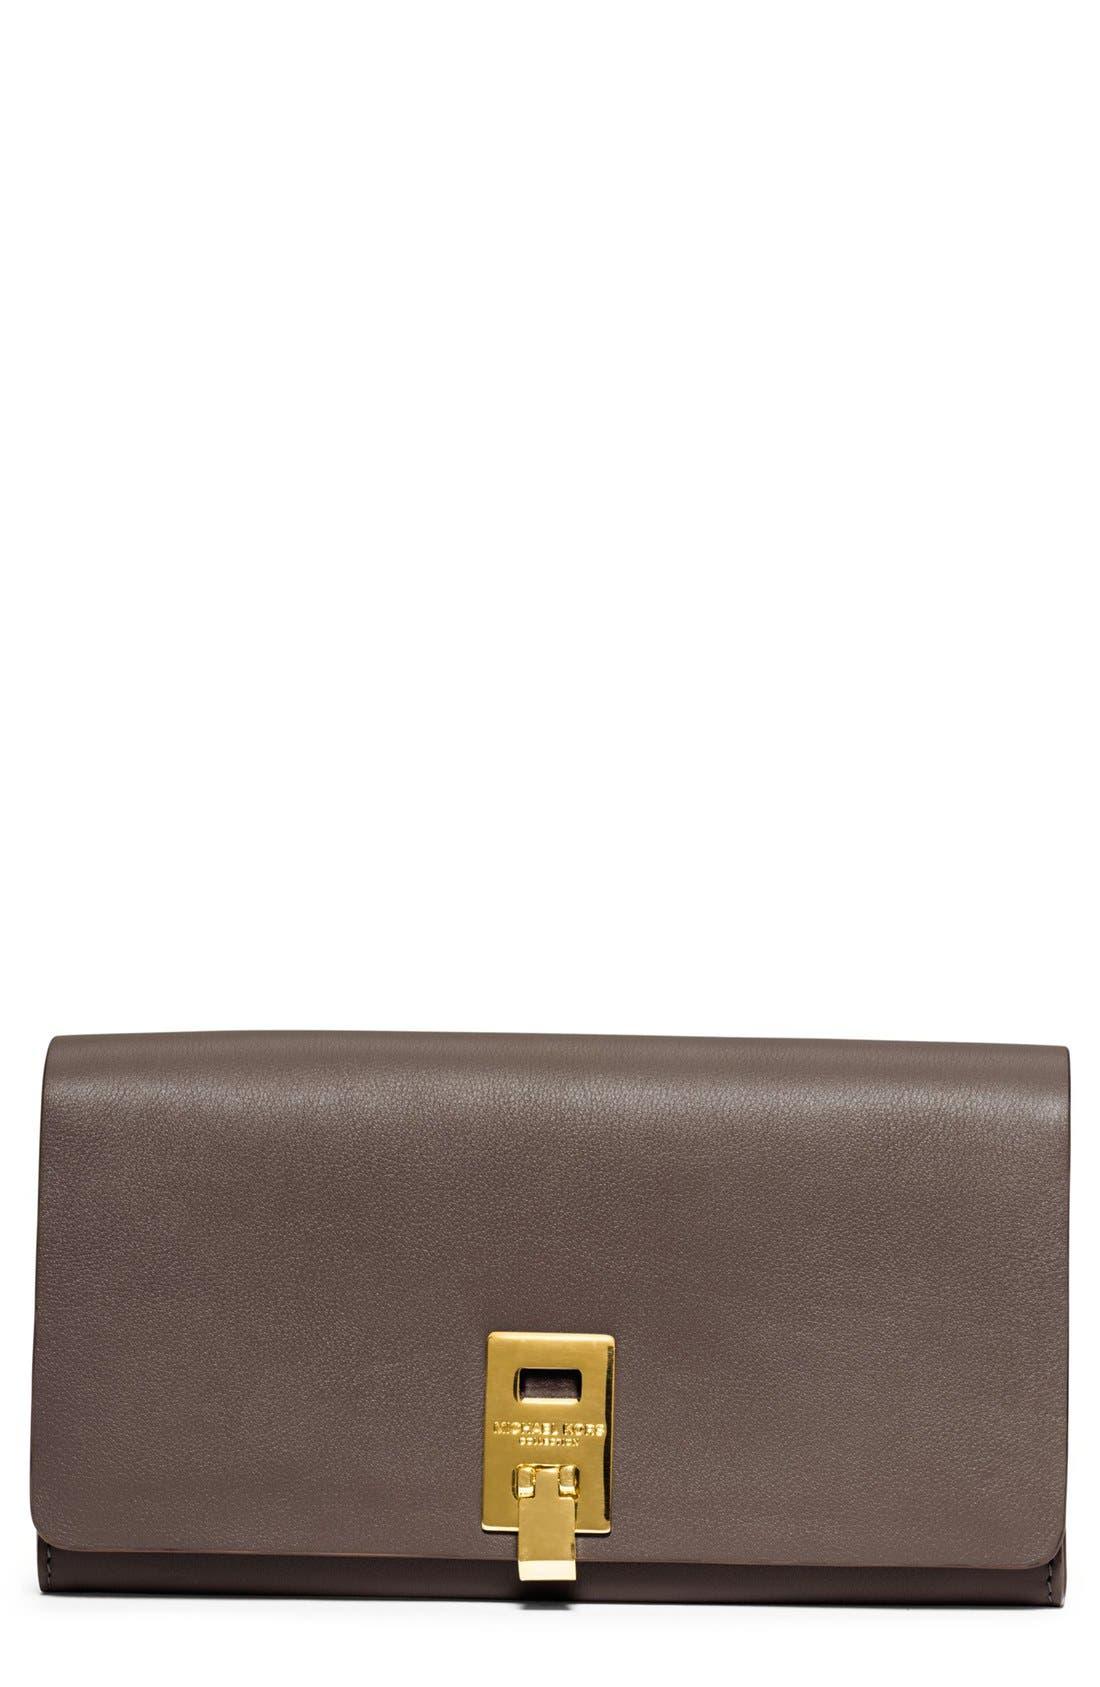 Alternate Image 1 Selected - Michael Kors 'Miranda' Leather Continental Wallet